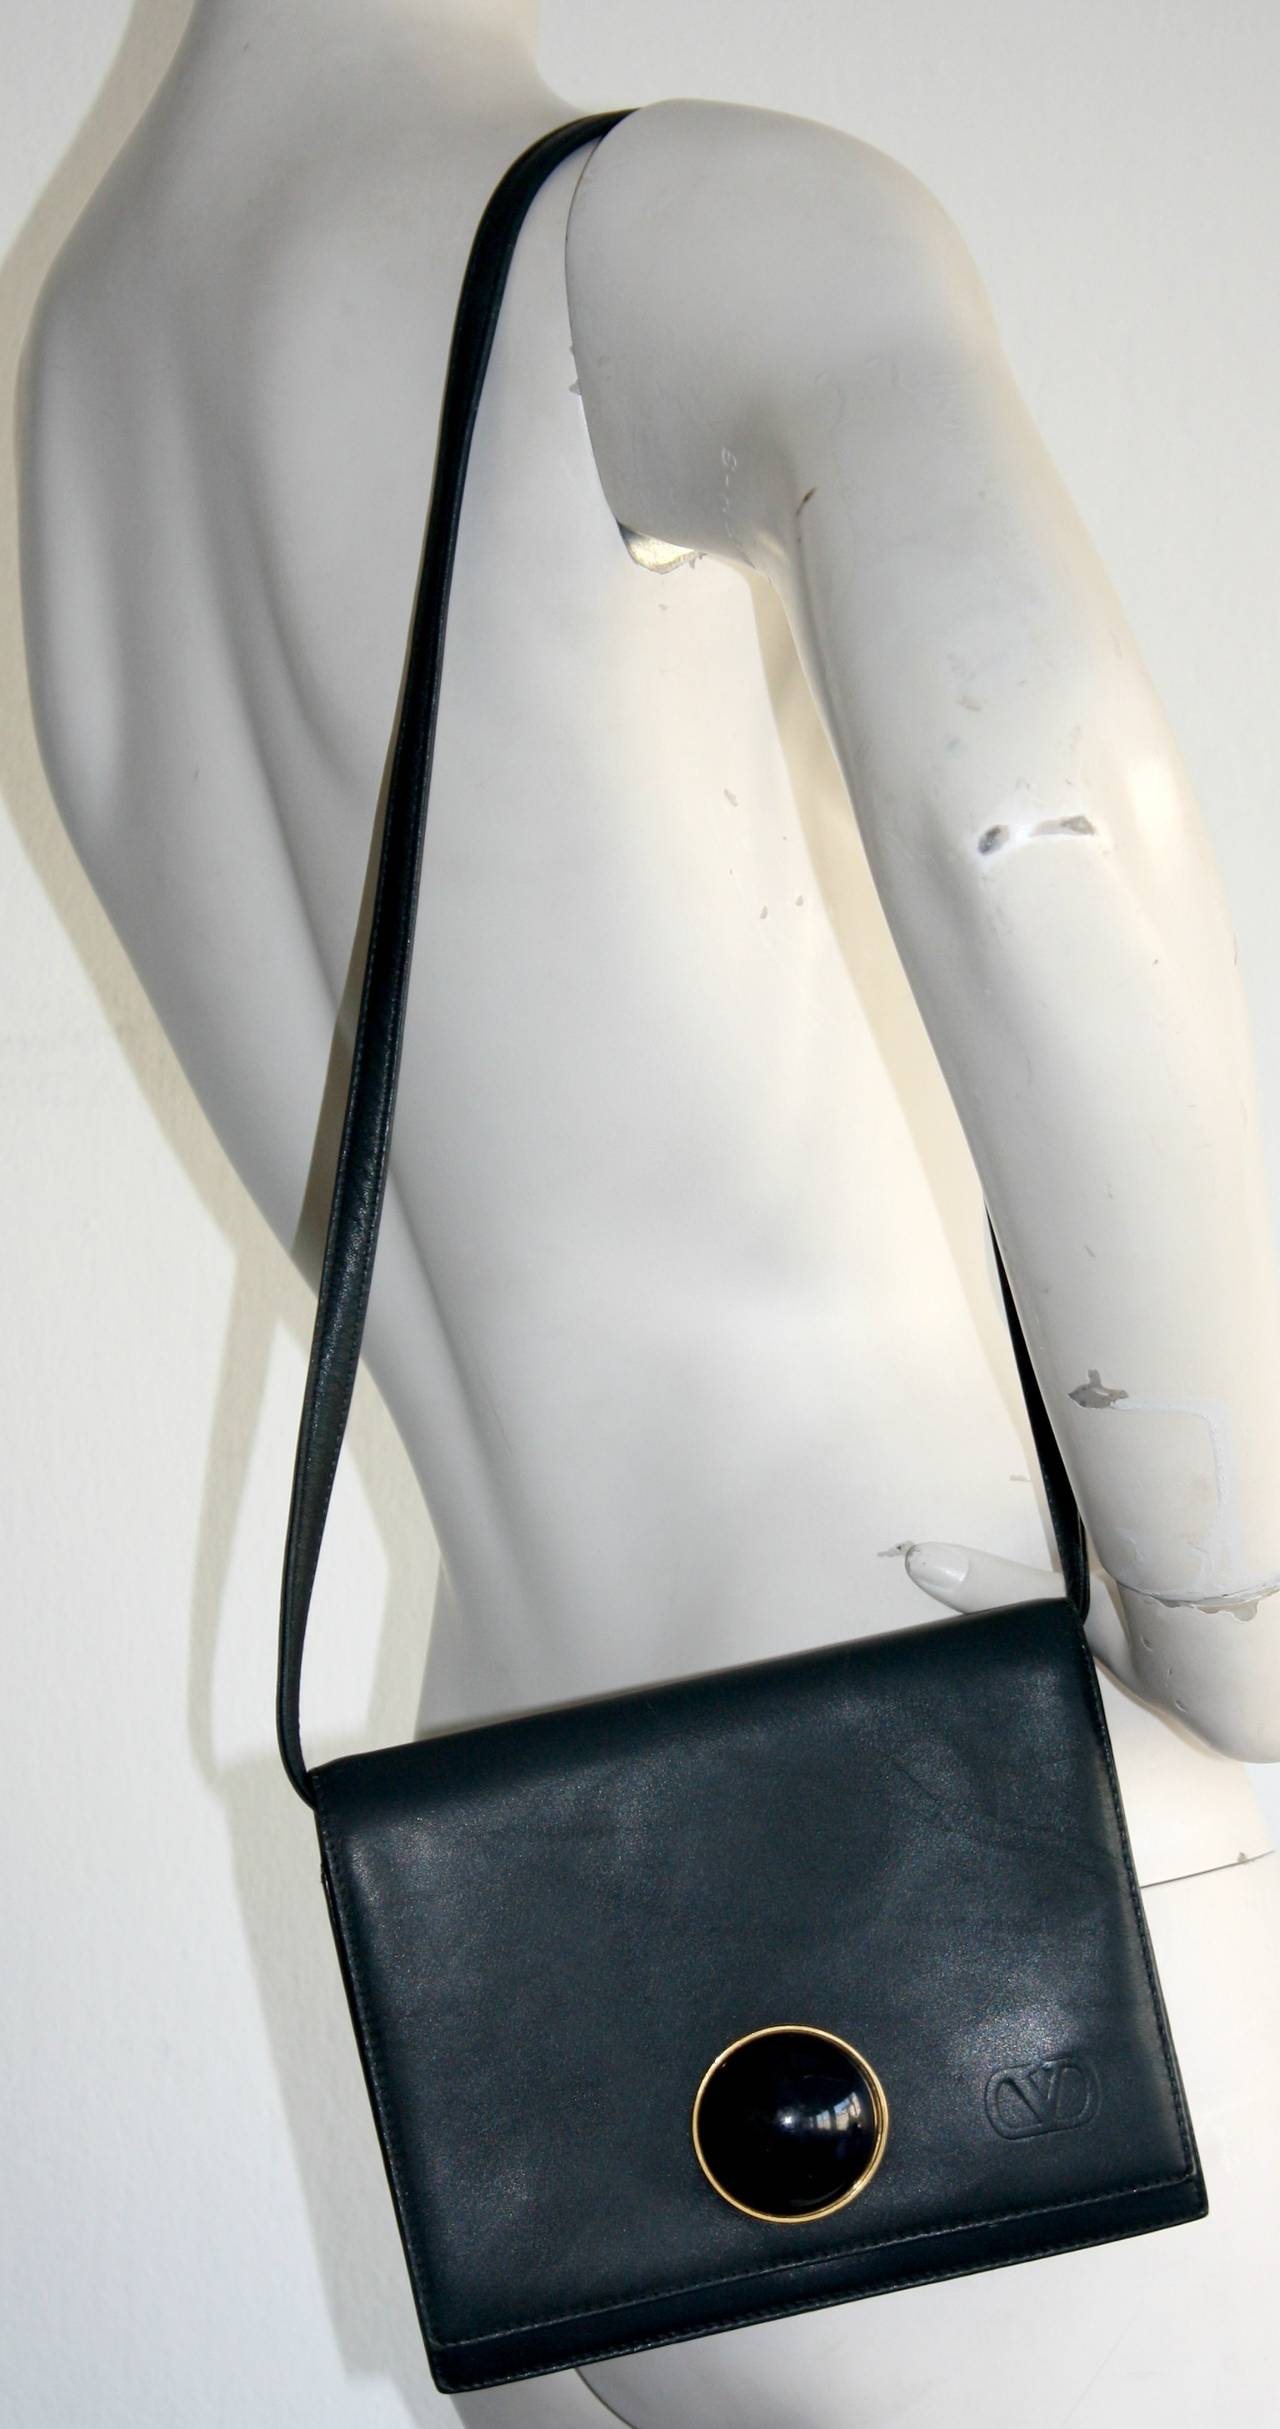 Valentino Rare 1960s Vintage Valentino Navy Blue Space Age Convertible Clutch Handbag Tiex5BFUU